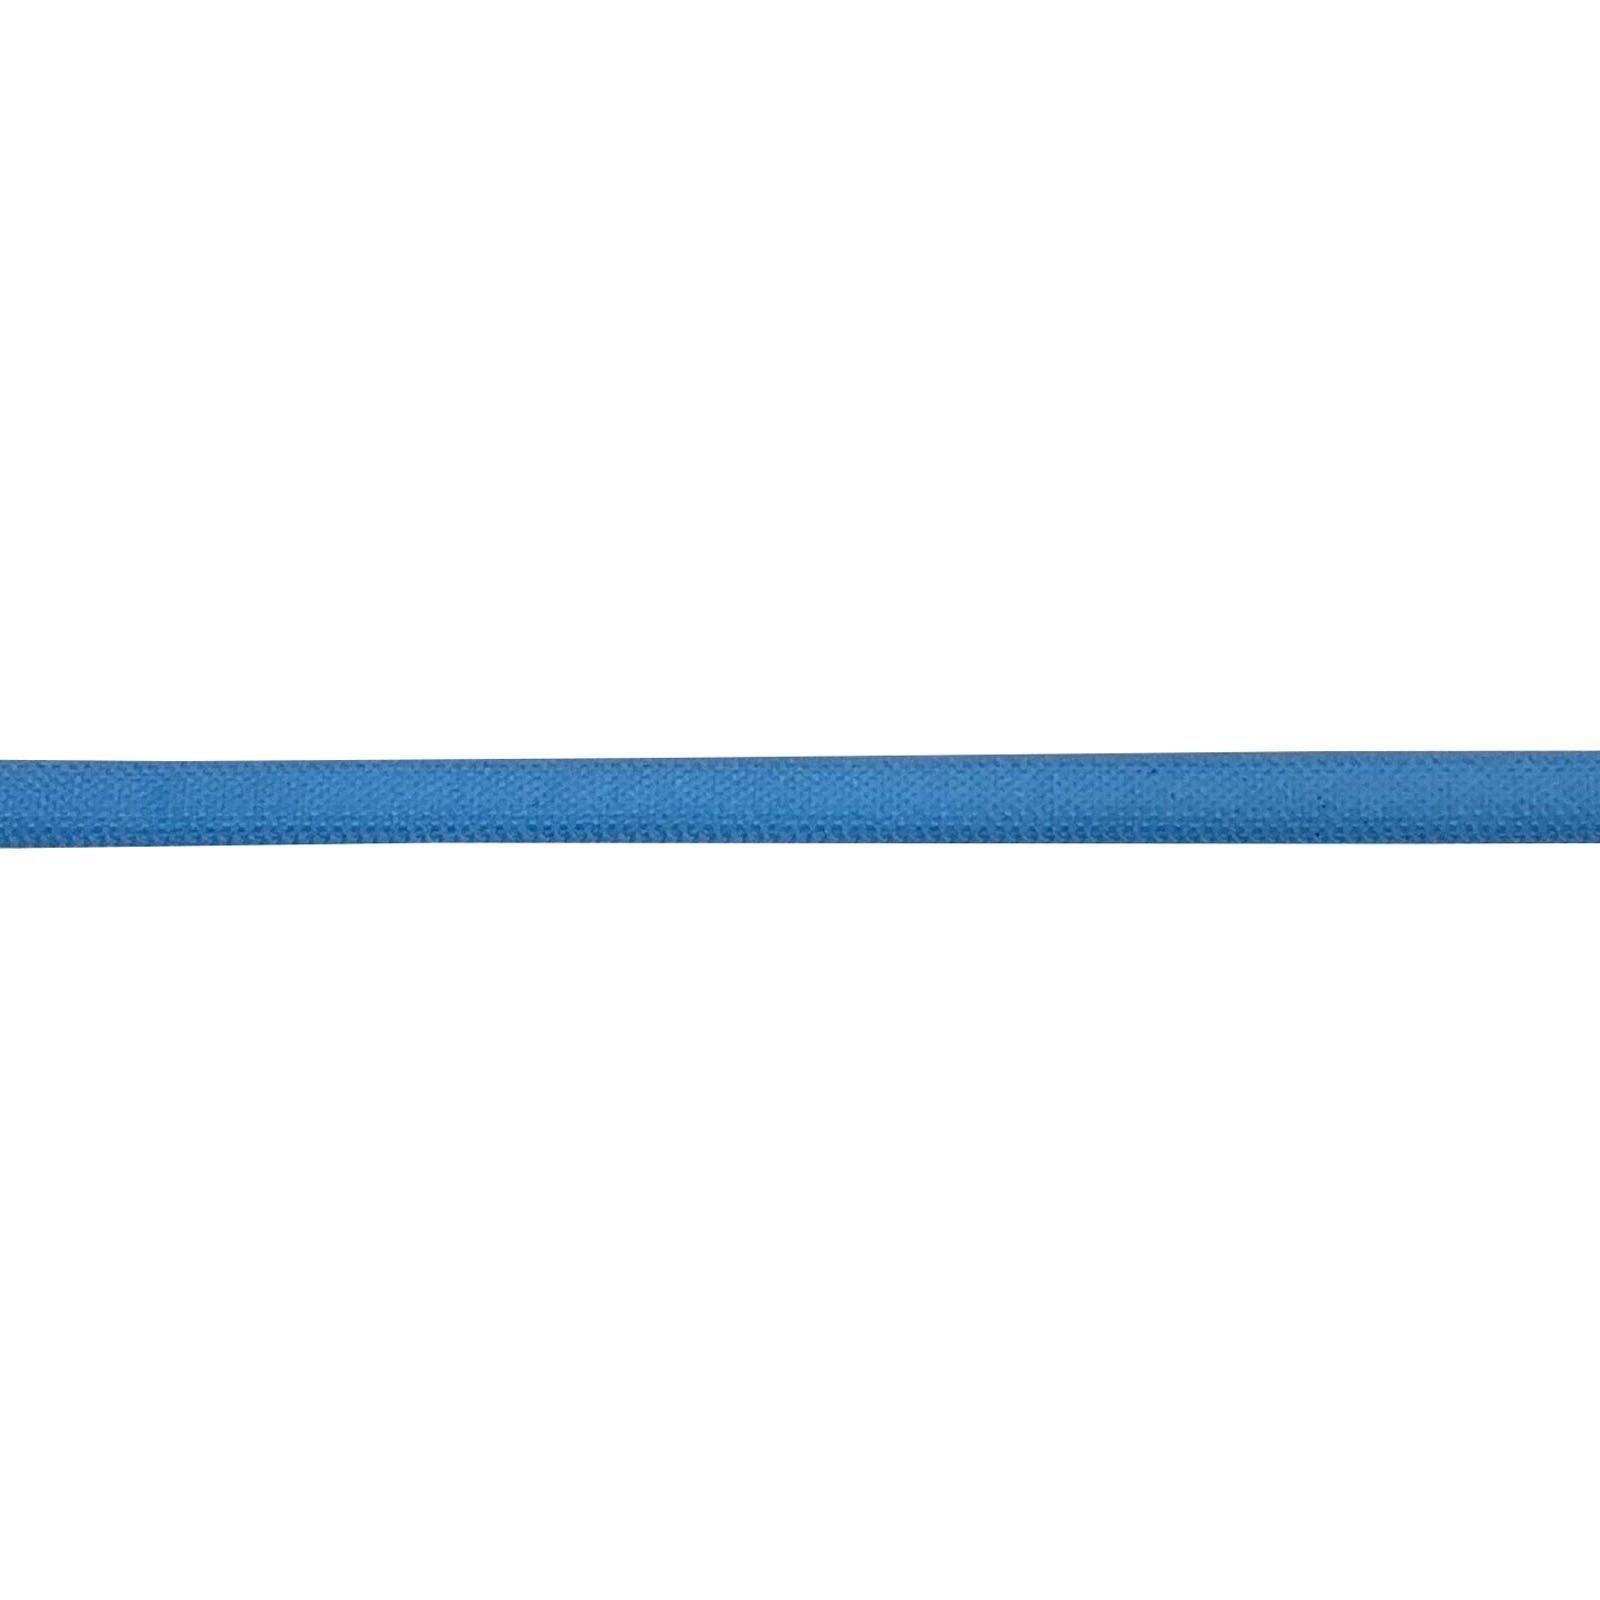 5 yds Banded Stretch Elastic 1/6 LIGHT BLUE- GANEL-NB-LIB